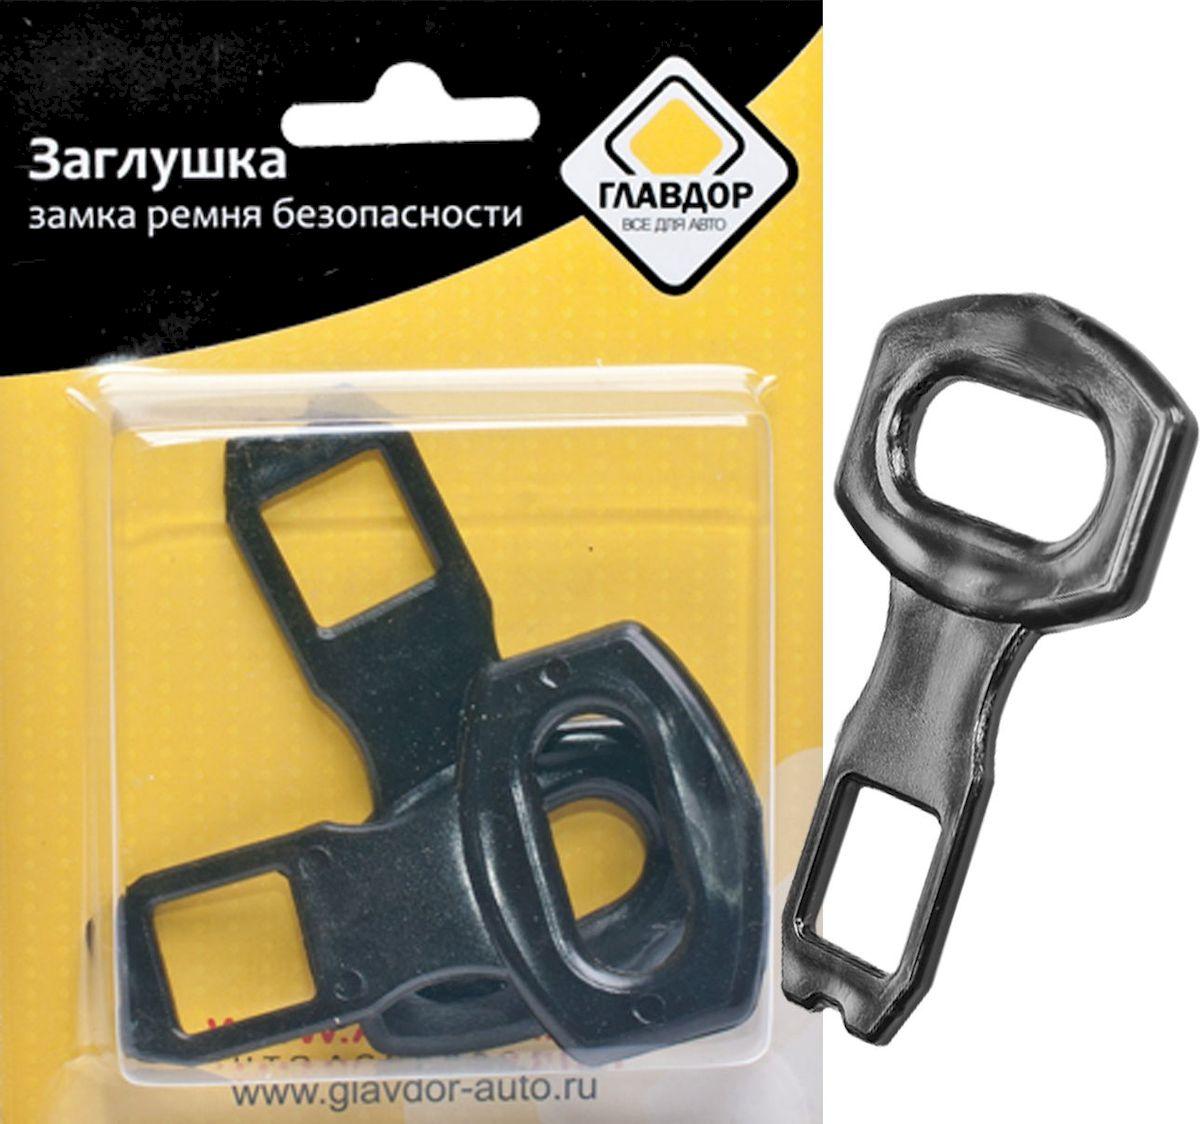 Заглушка замка ремня безопасности Главдор, 2 шт. GL-29